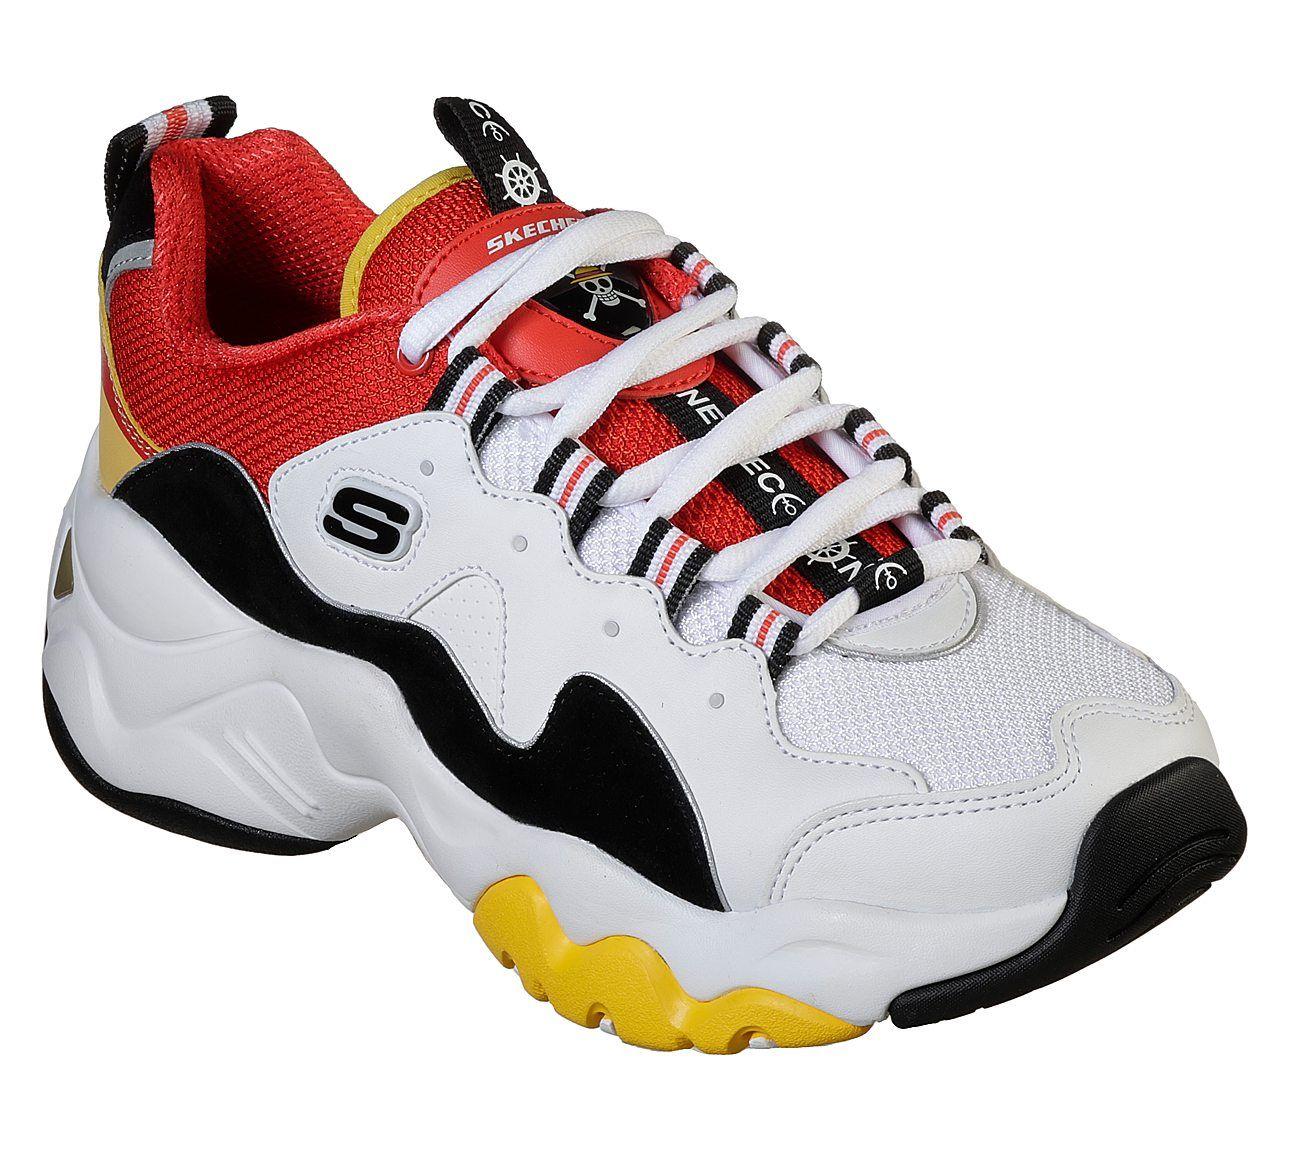 Sketchers shoes women, Skechers